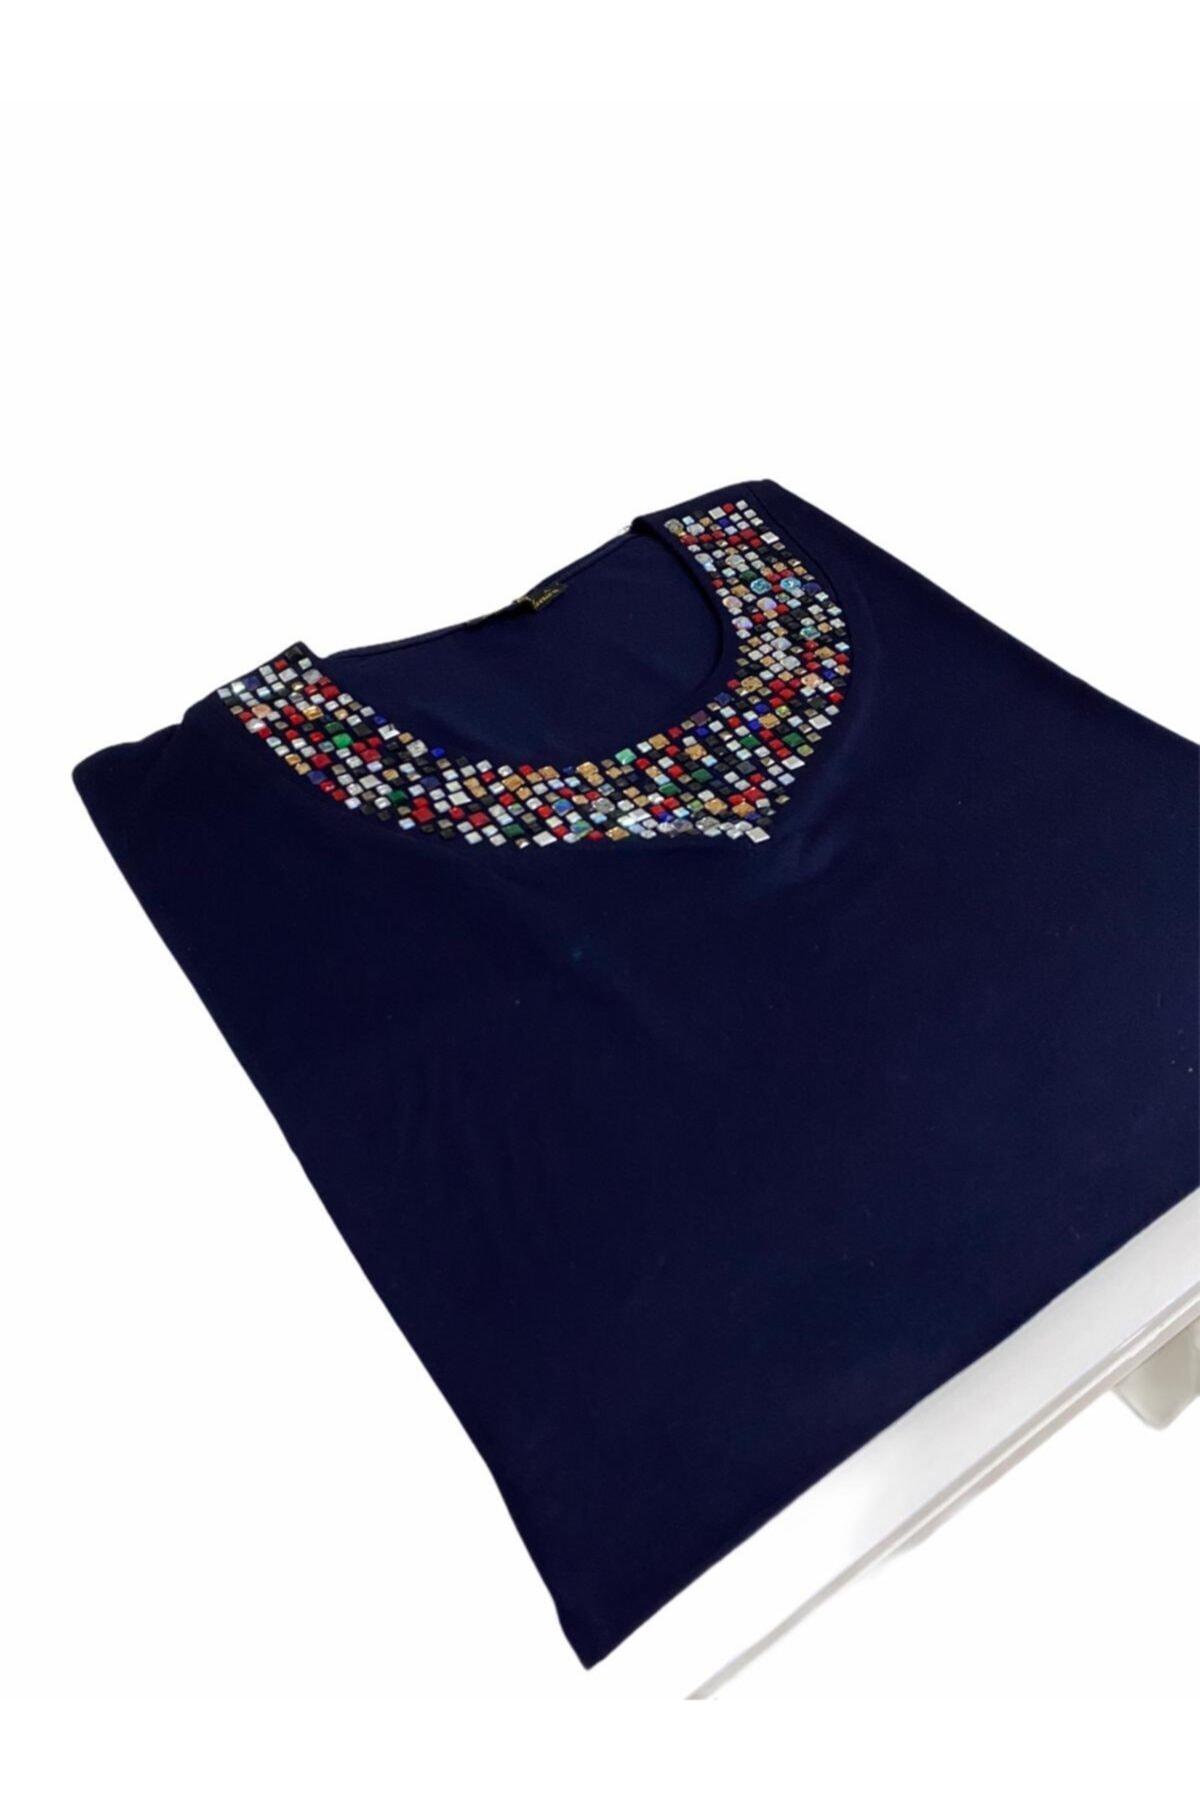 Elele Lacivert Renkli Taş Baskı 0 Yaka Anne Penye Bluz 1